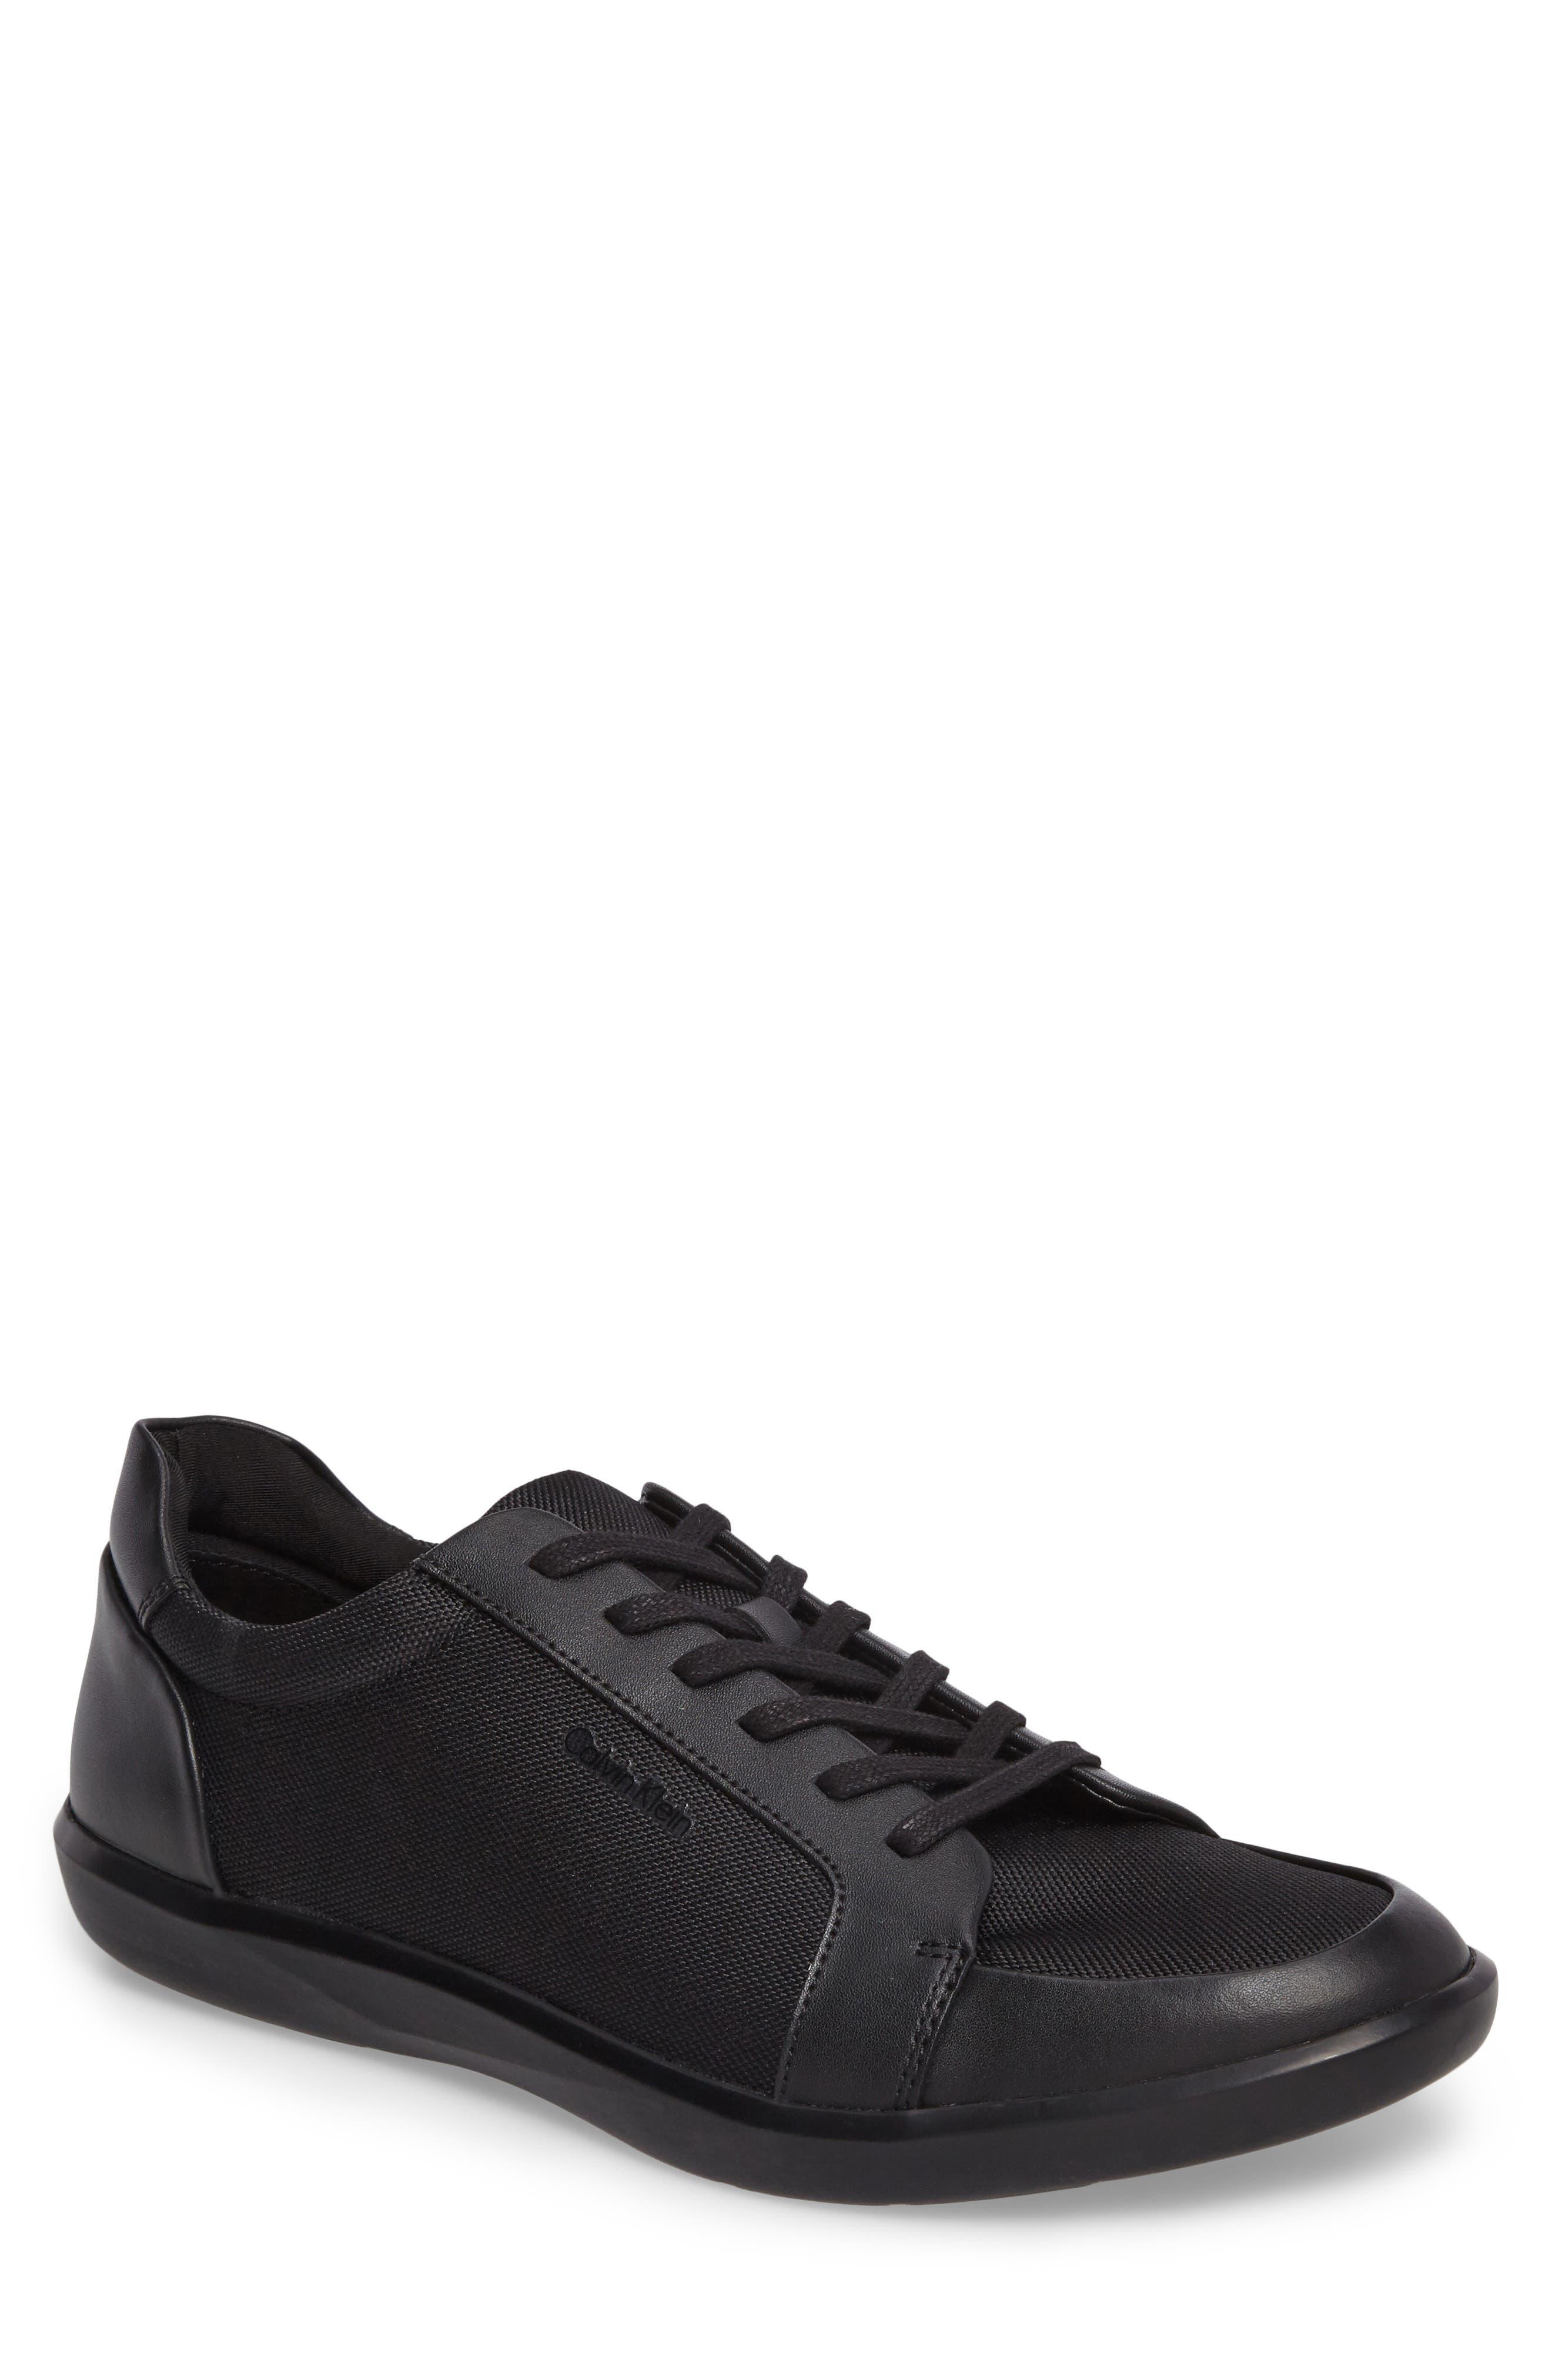 Main Image - Calvin Klein Macabee Sneaker (Men)